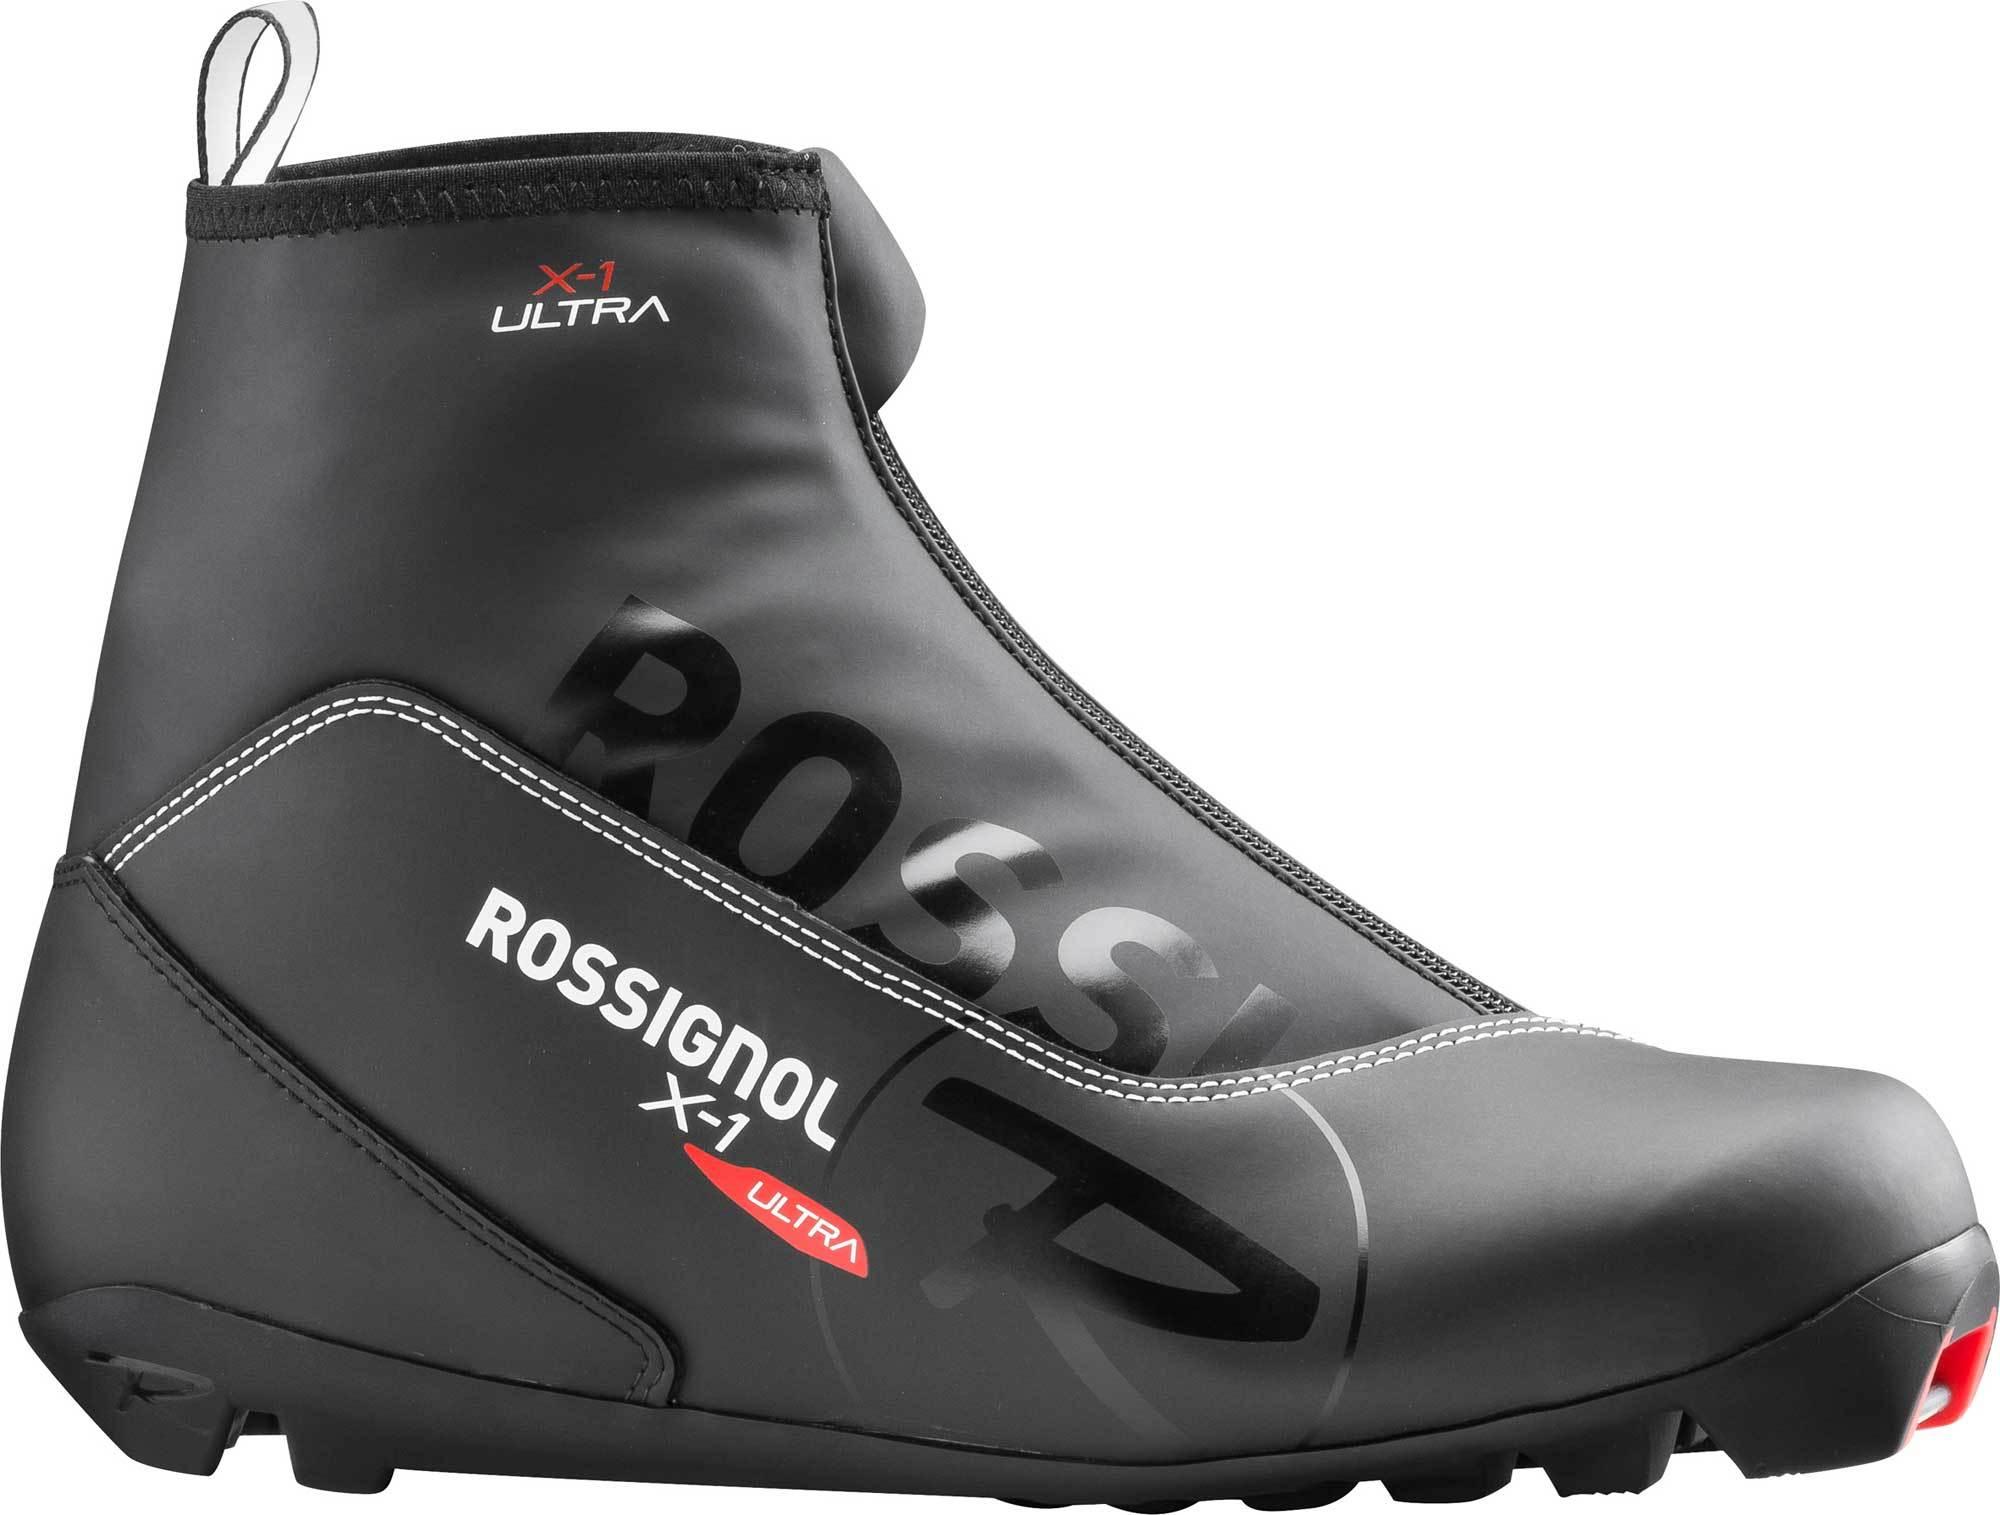 Rossignol X-1 Ultra 35